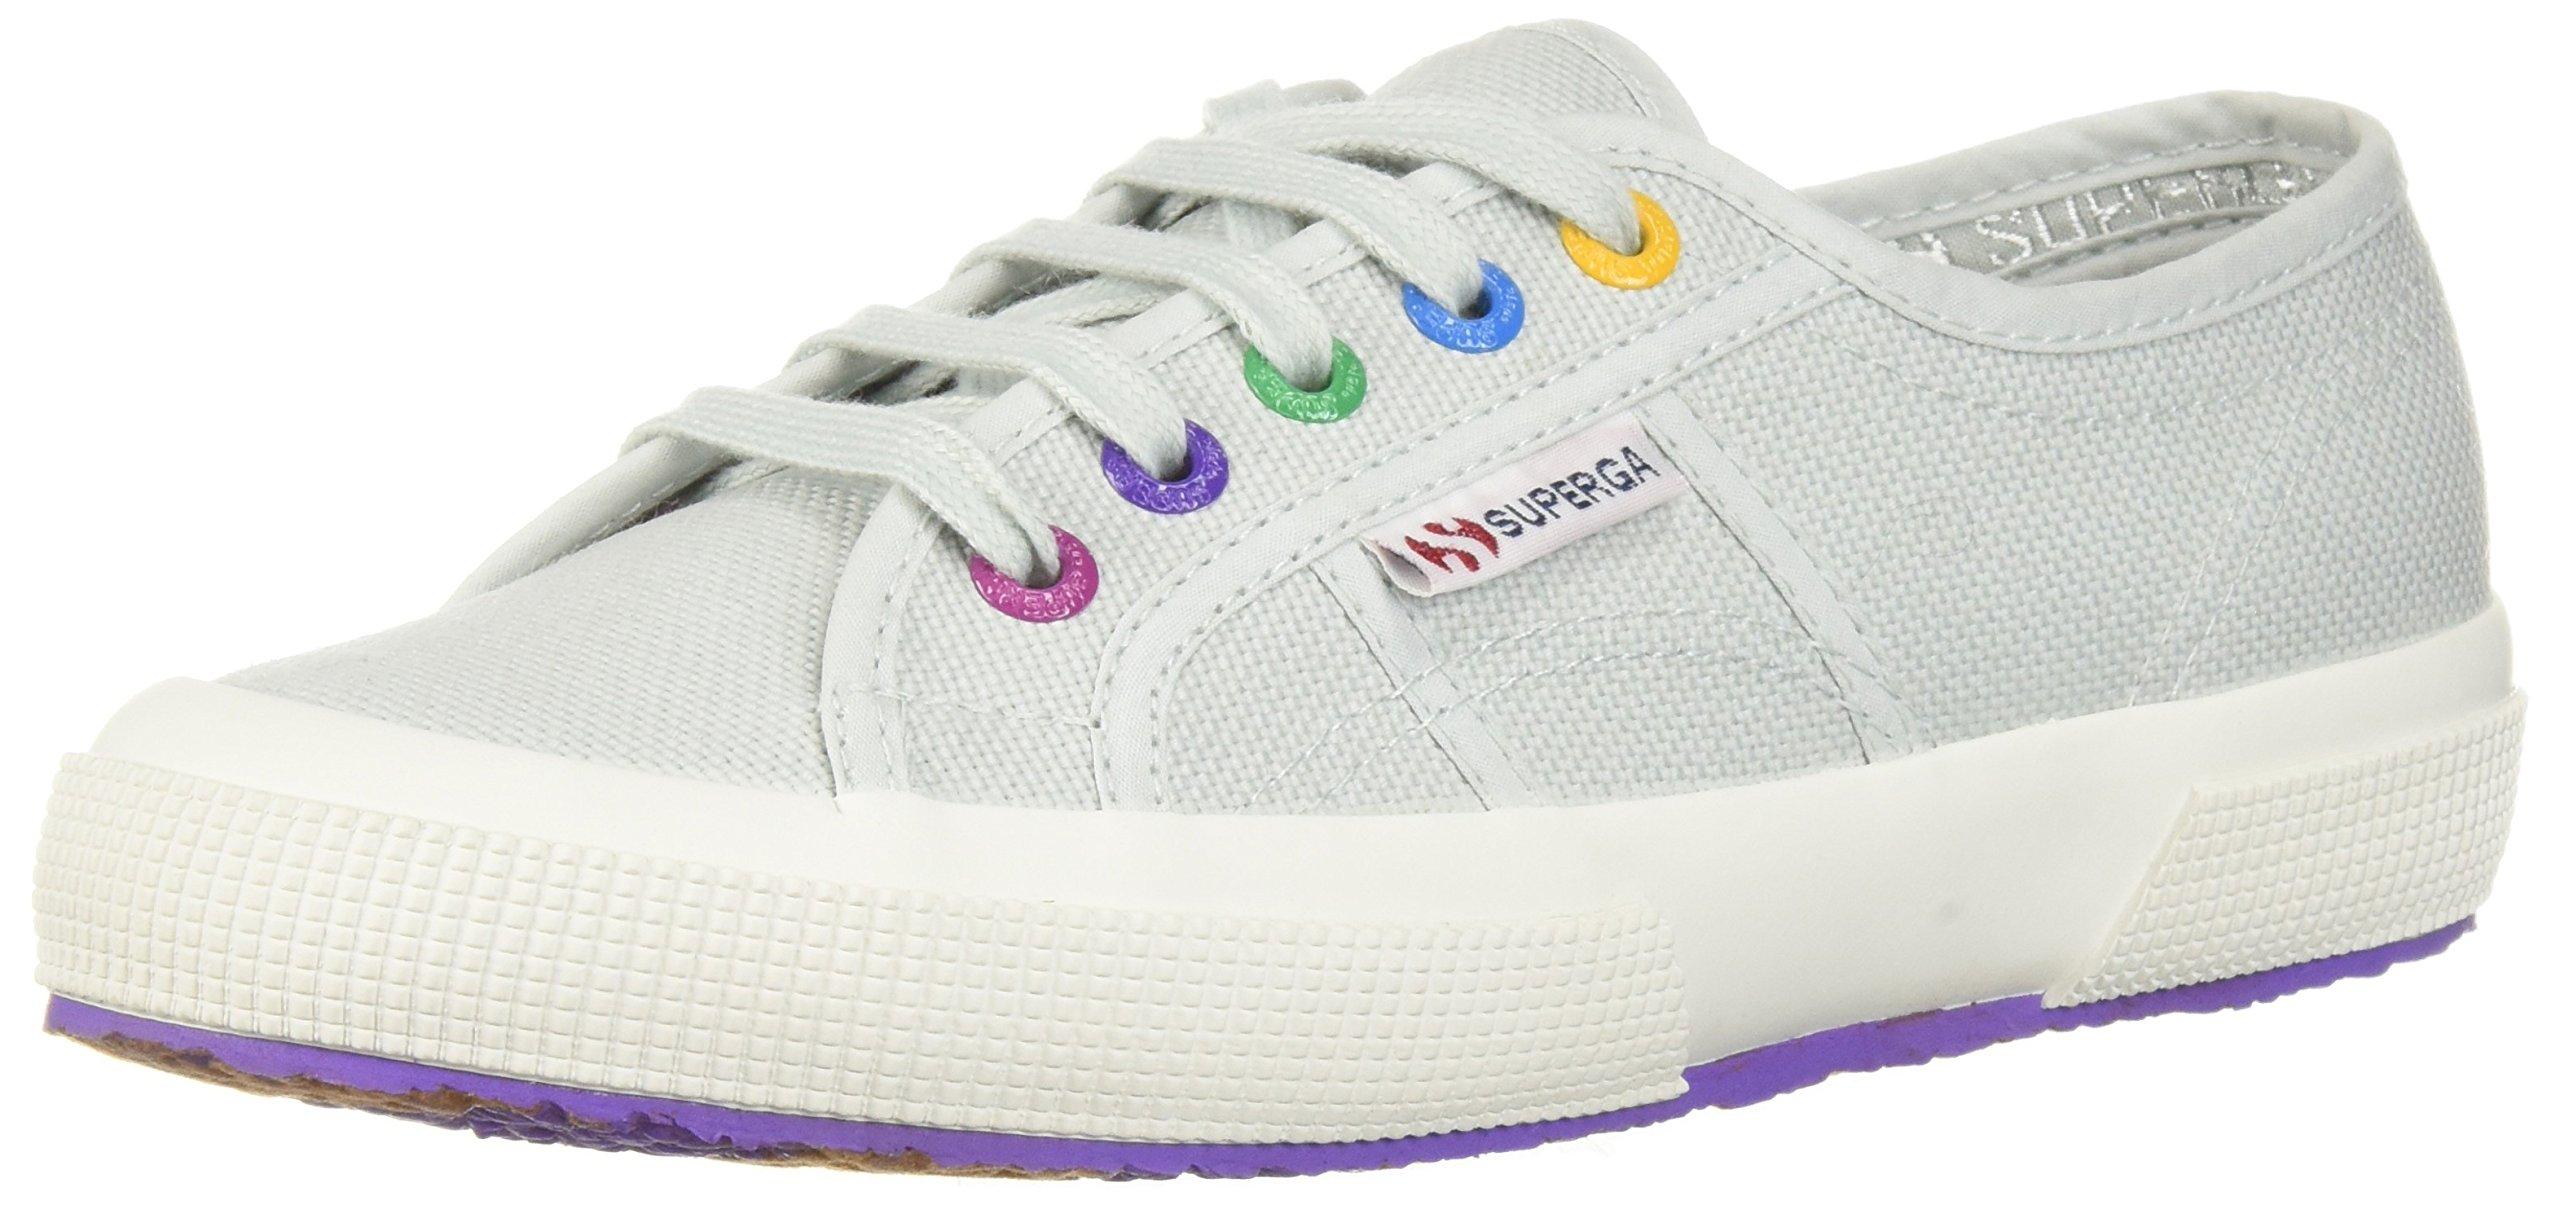 Superga Women's 2750 Multi Color Eyelets Sneaker, Alluminum, 37.5 M EU (7 US)